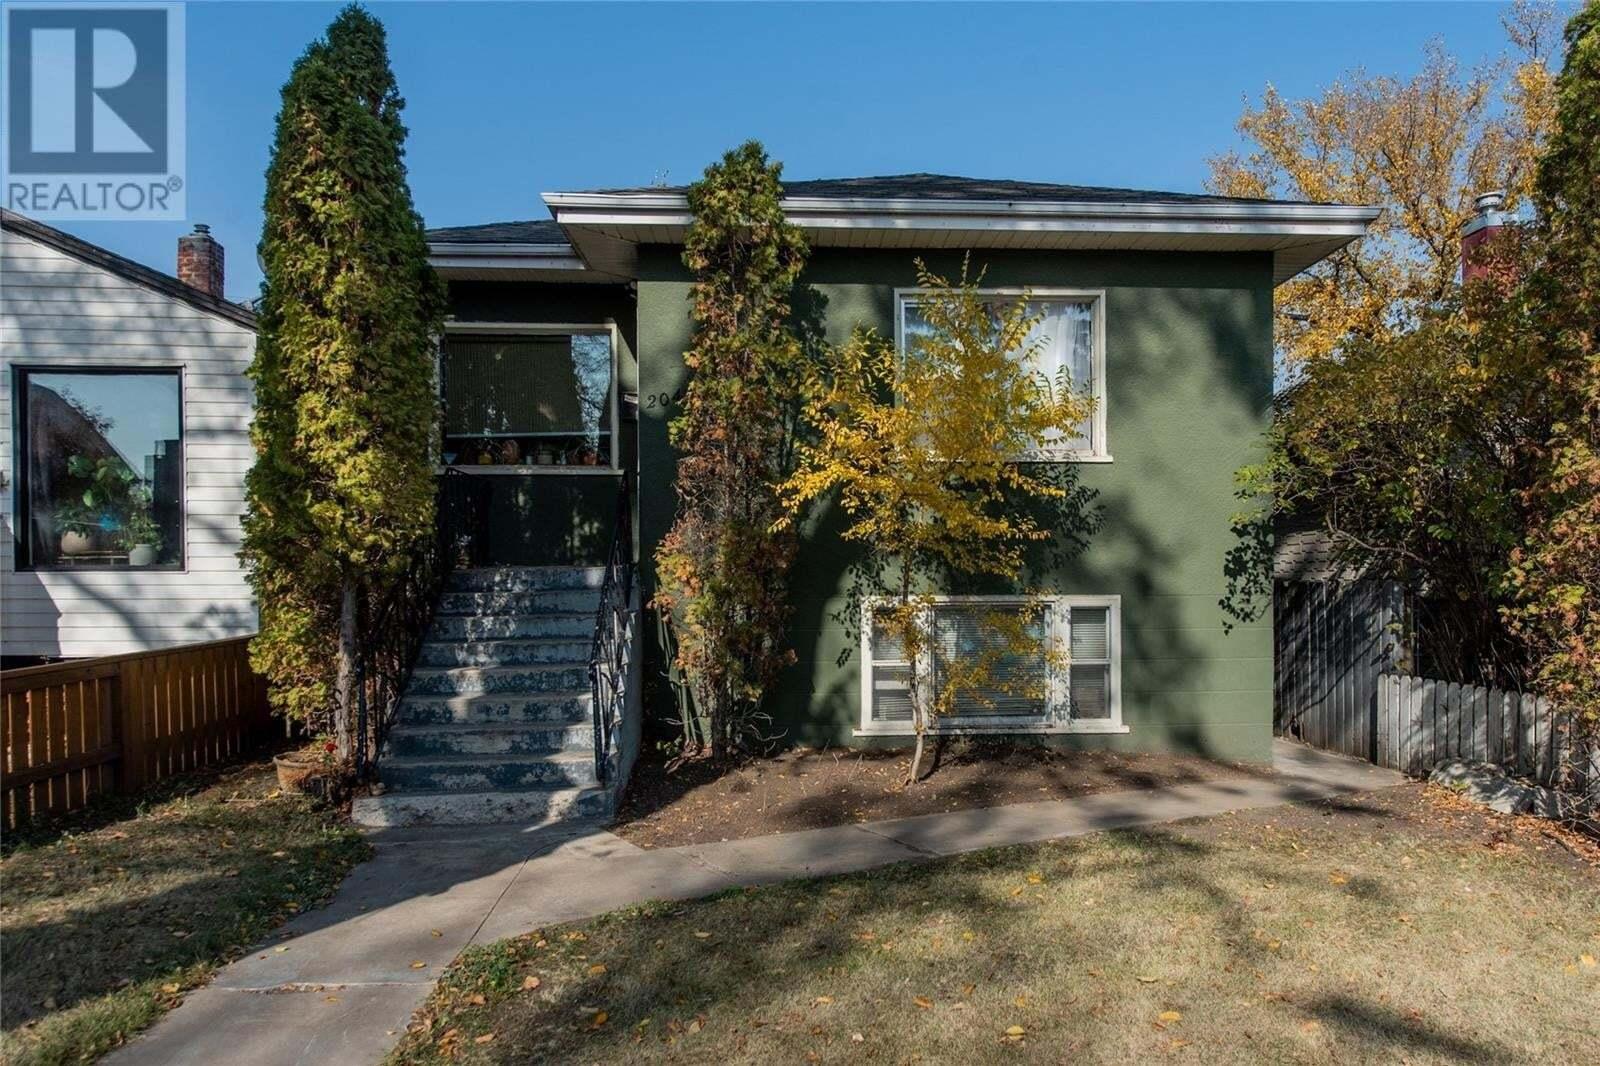 House for sale at 204 25th St W Saskatoon Saskatchewan - MLS: SK828939